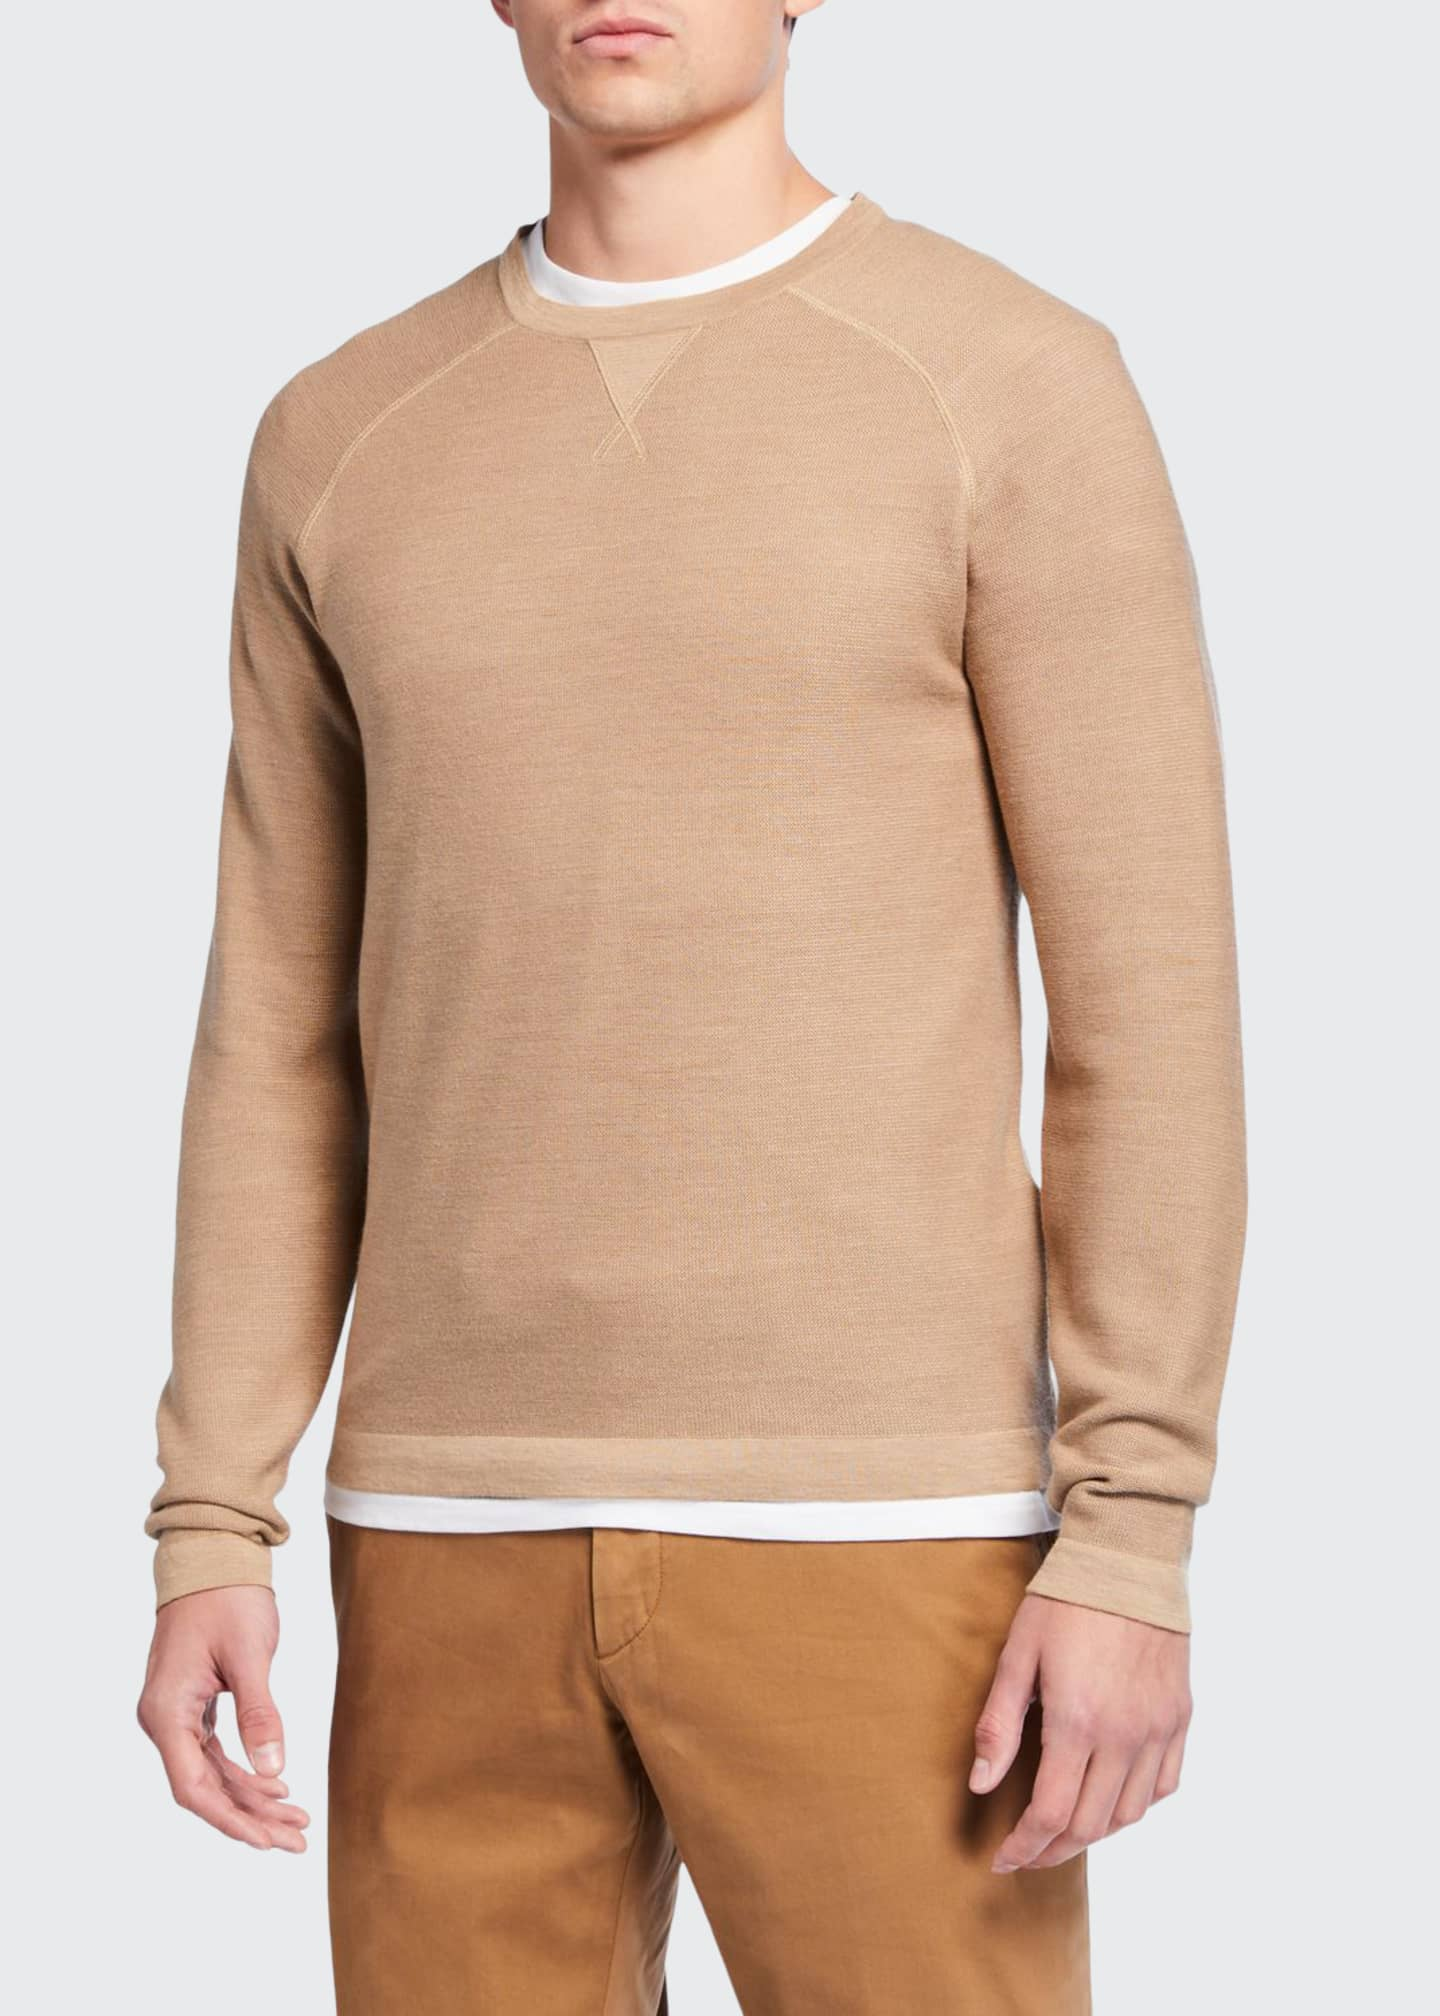 Ermenegildo Zegna Men's Solid Silk-Cotton Crewneck Sweater